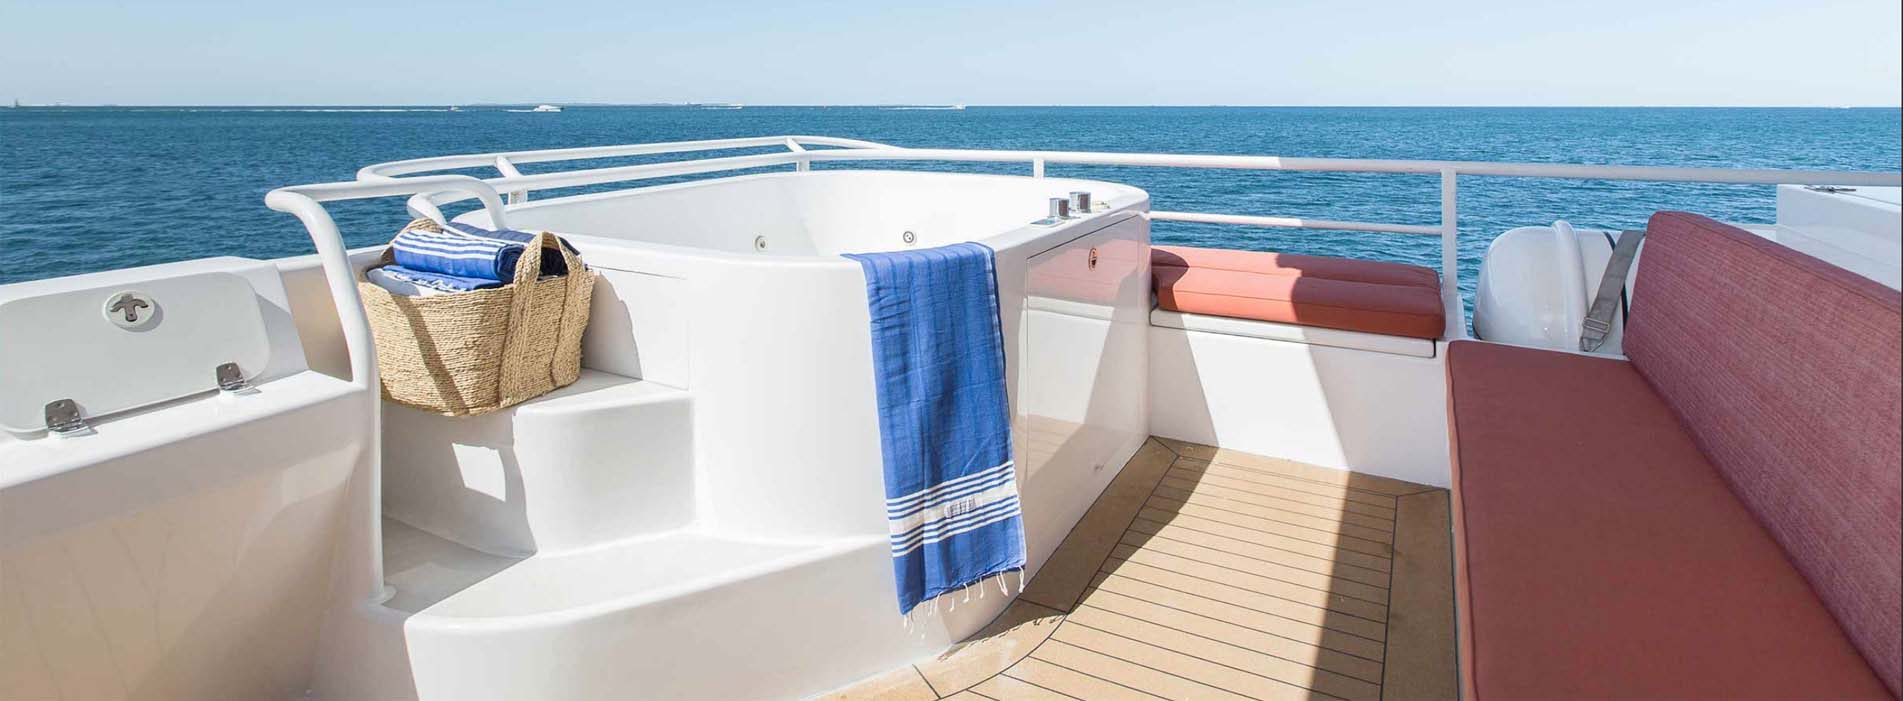 OCEAN-DREAM-spa-on-back-deck